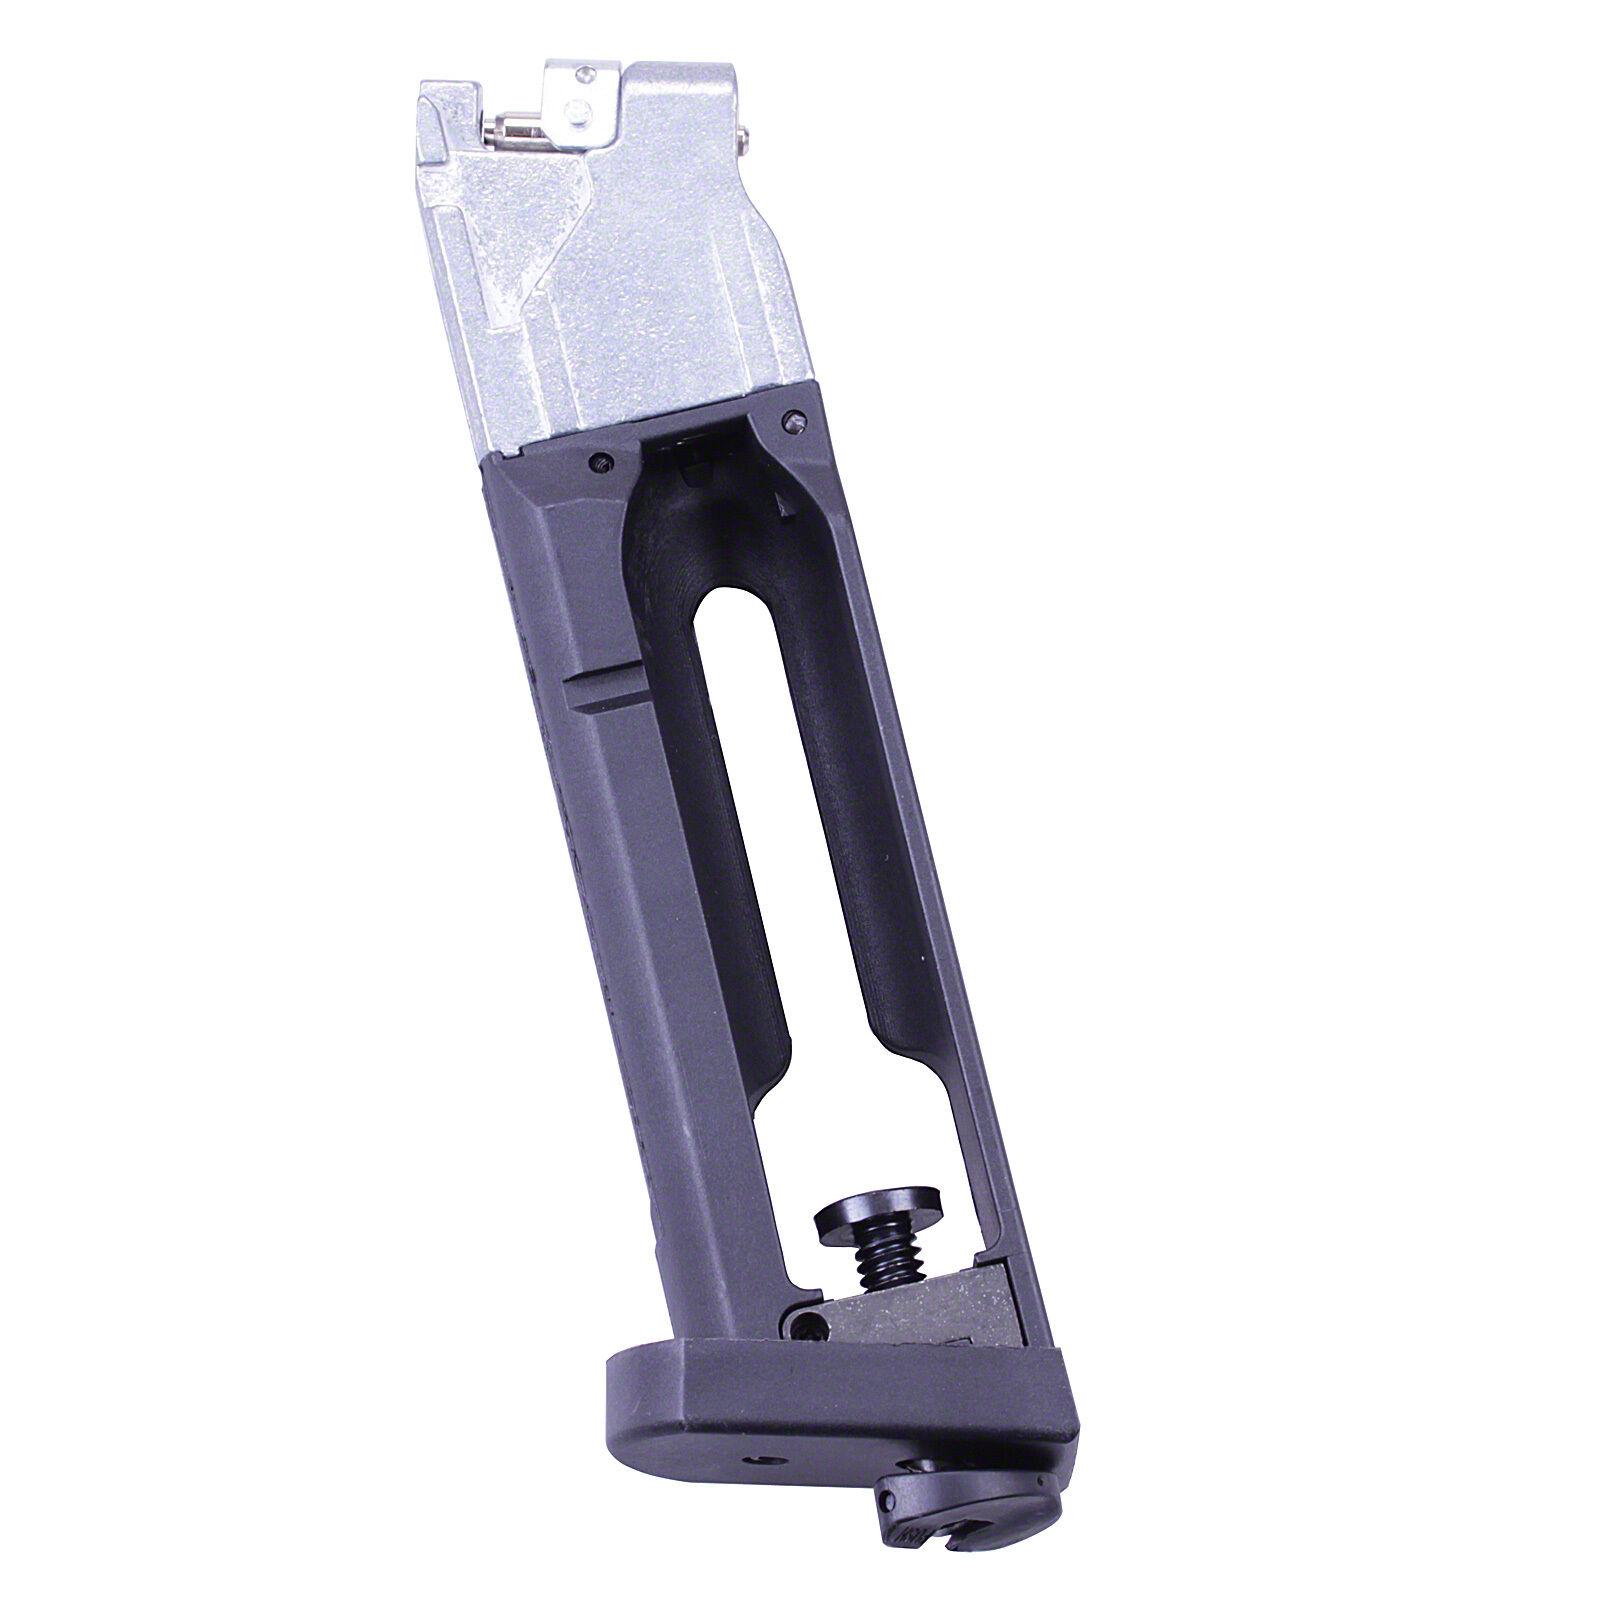 Umarex Beretta 90 two .177 Magazine Mag 90 2 Co2 4.5mm BBs 21 Round 5.8164.1